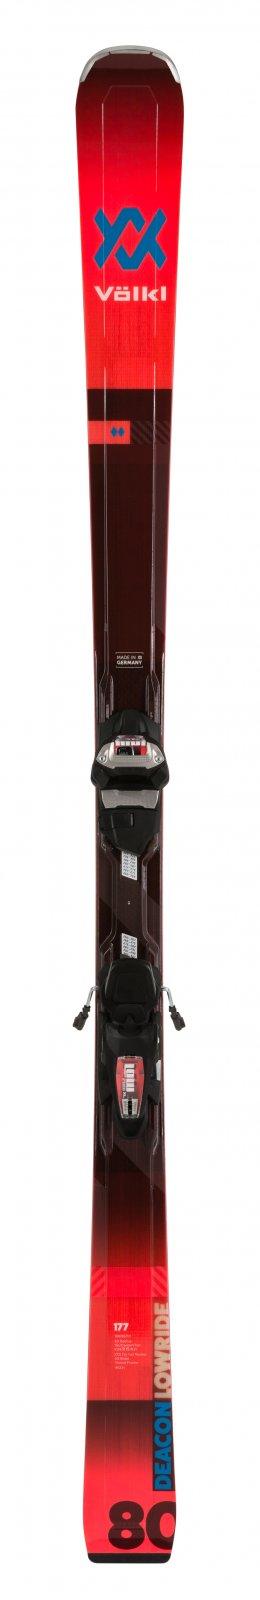 Volkl Deacon 80 + LowRide XL 13 FR Demo GW Flo-Red Skis 2020 - size 177cm